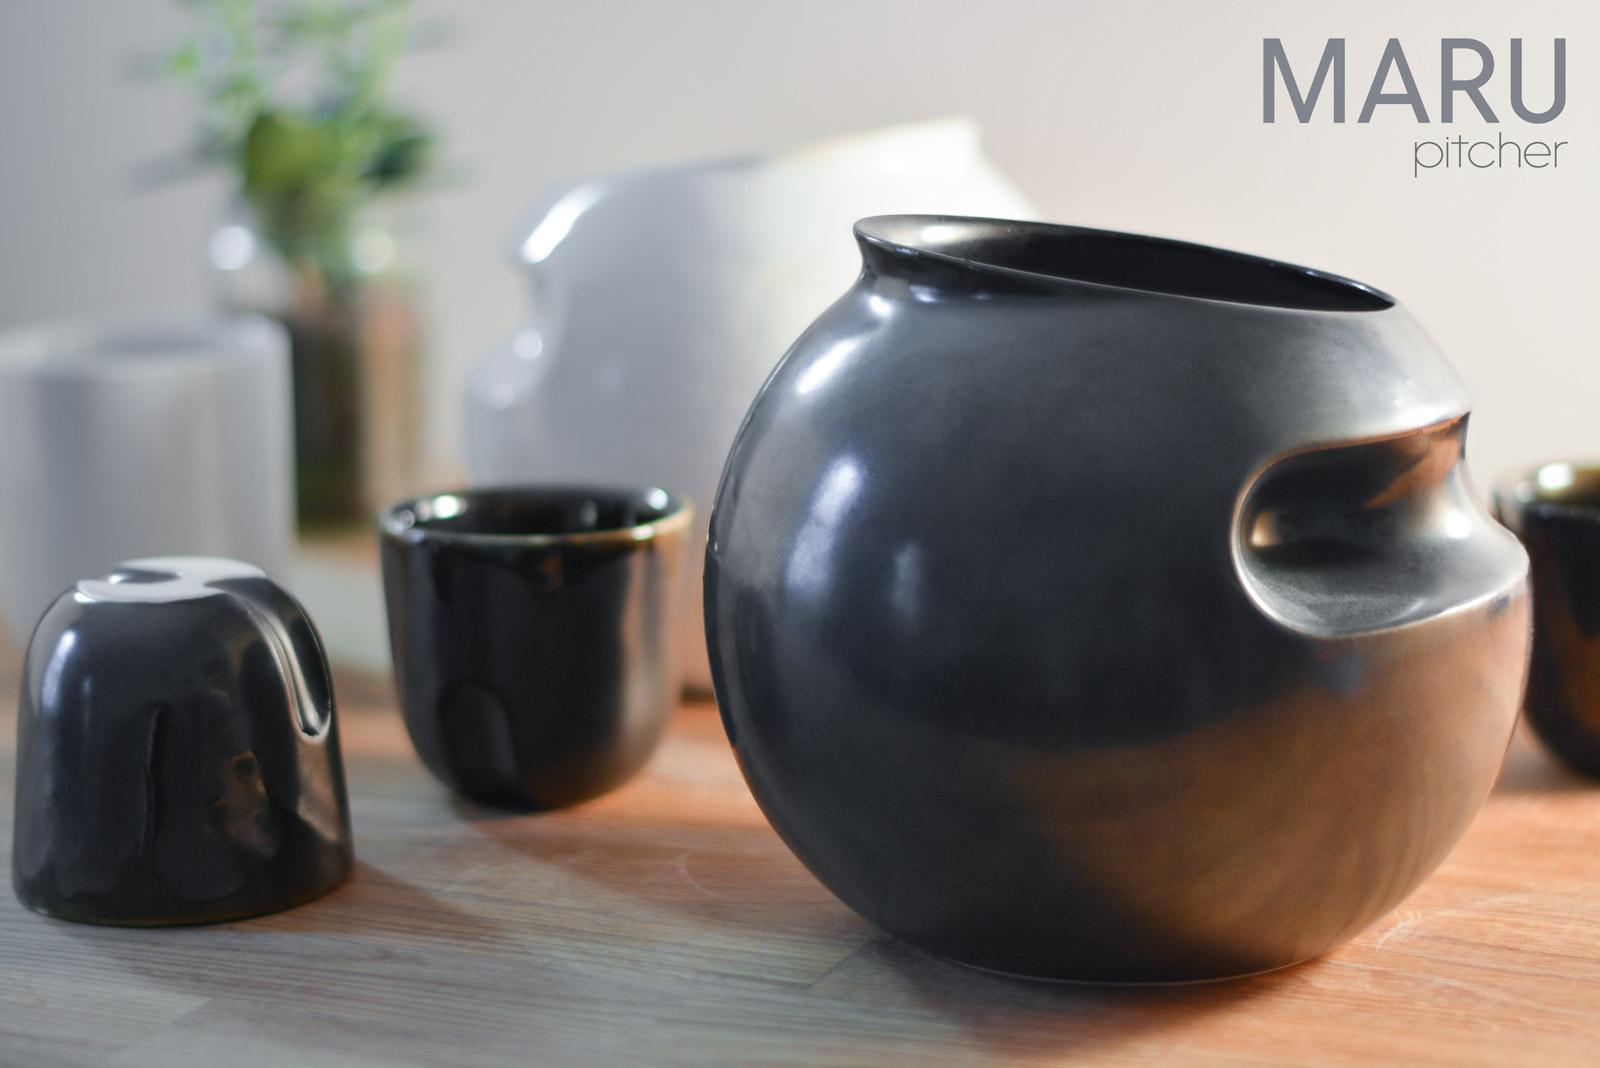 maru_pitcher